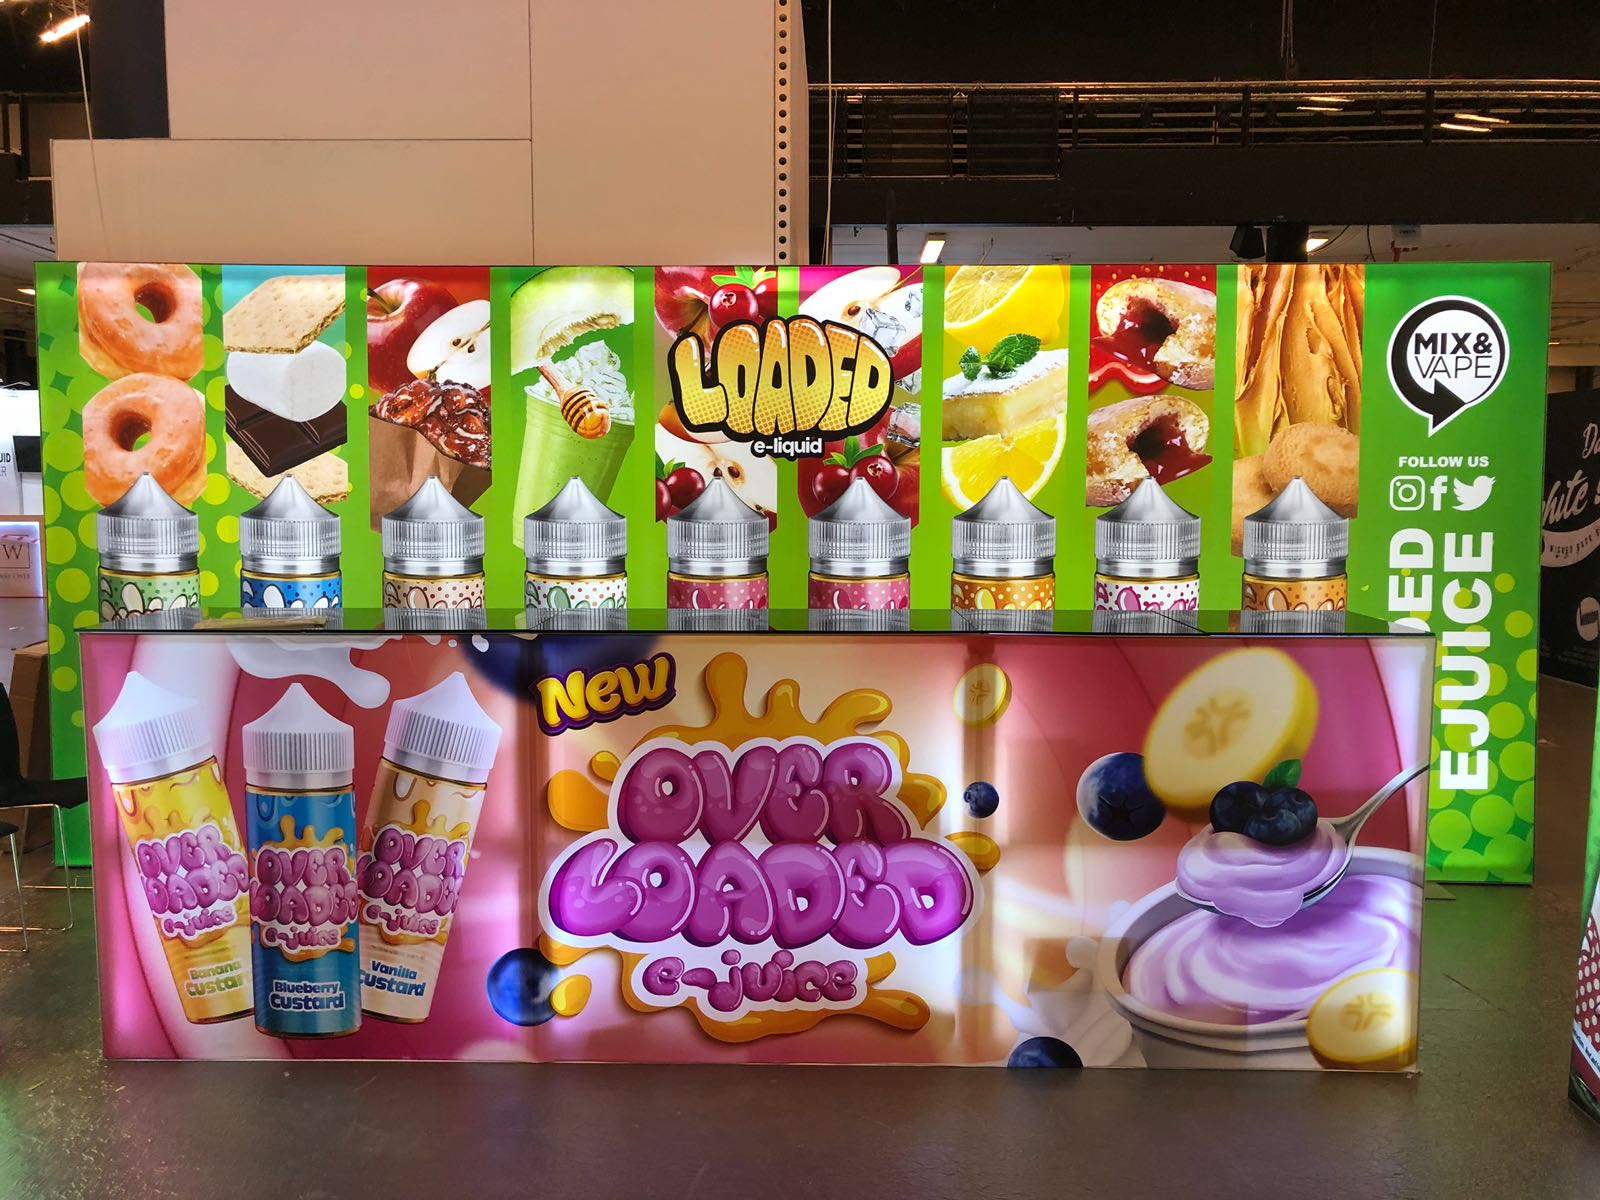 Loaded E-Juice Tradeshow Booth in Copenhagen Denmark